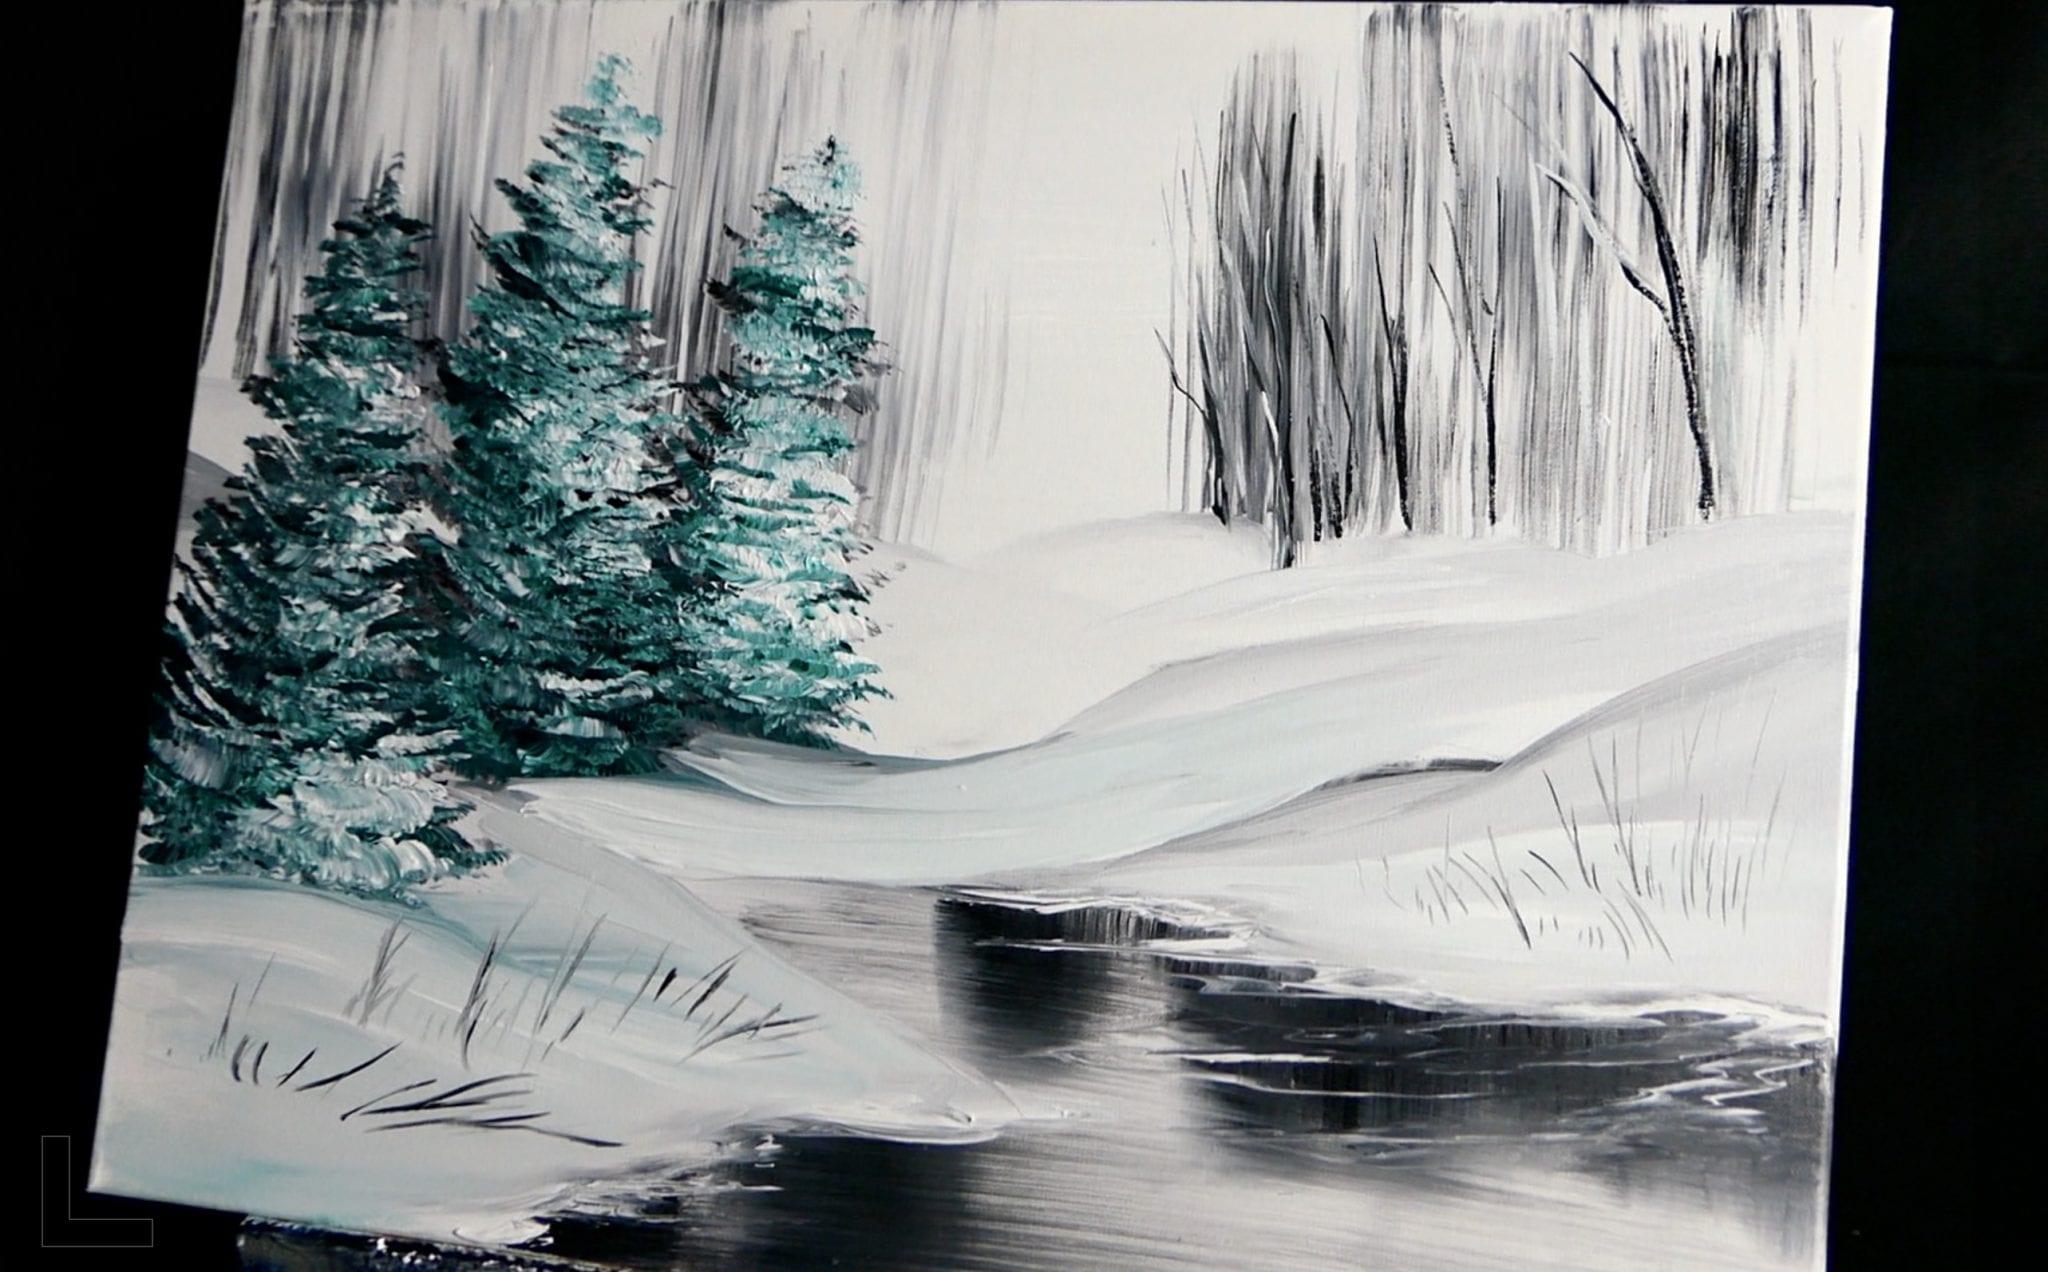 Frozen Pond Easy Acrylic Abstract Painting Techniques Dranitsin Urartstudio